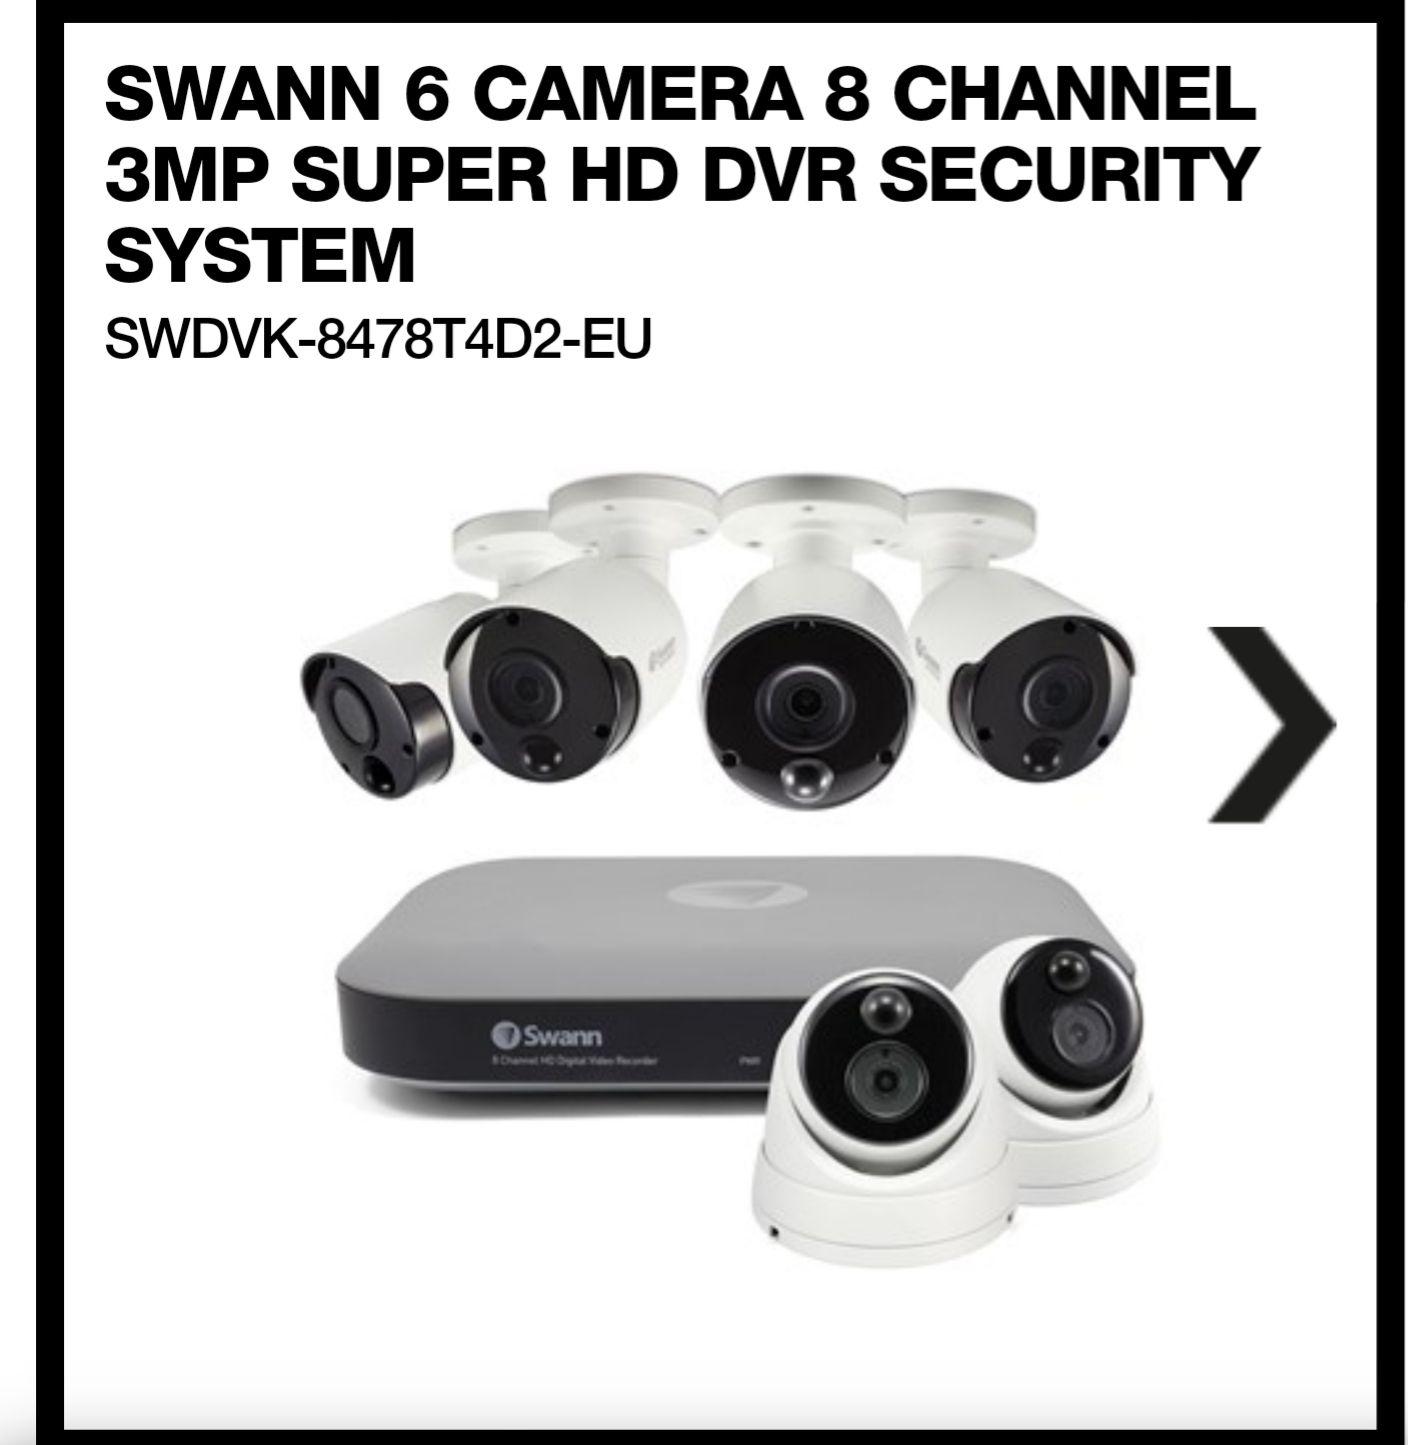 Swann 6 Camera 8 Channel 3MP Super HD DVR Security System - £249.99 @ Box